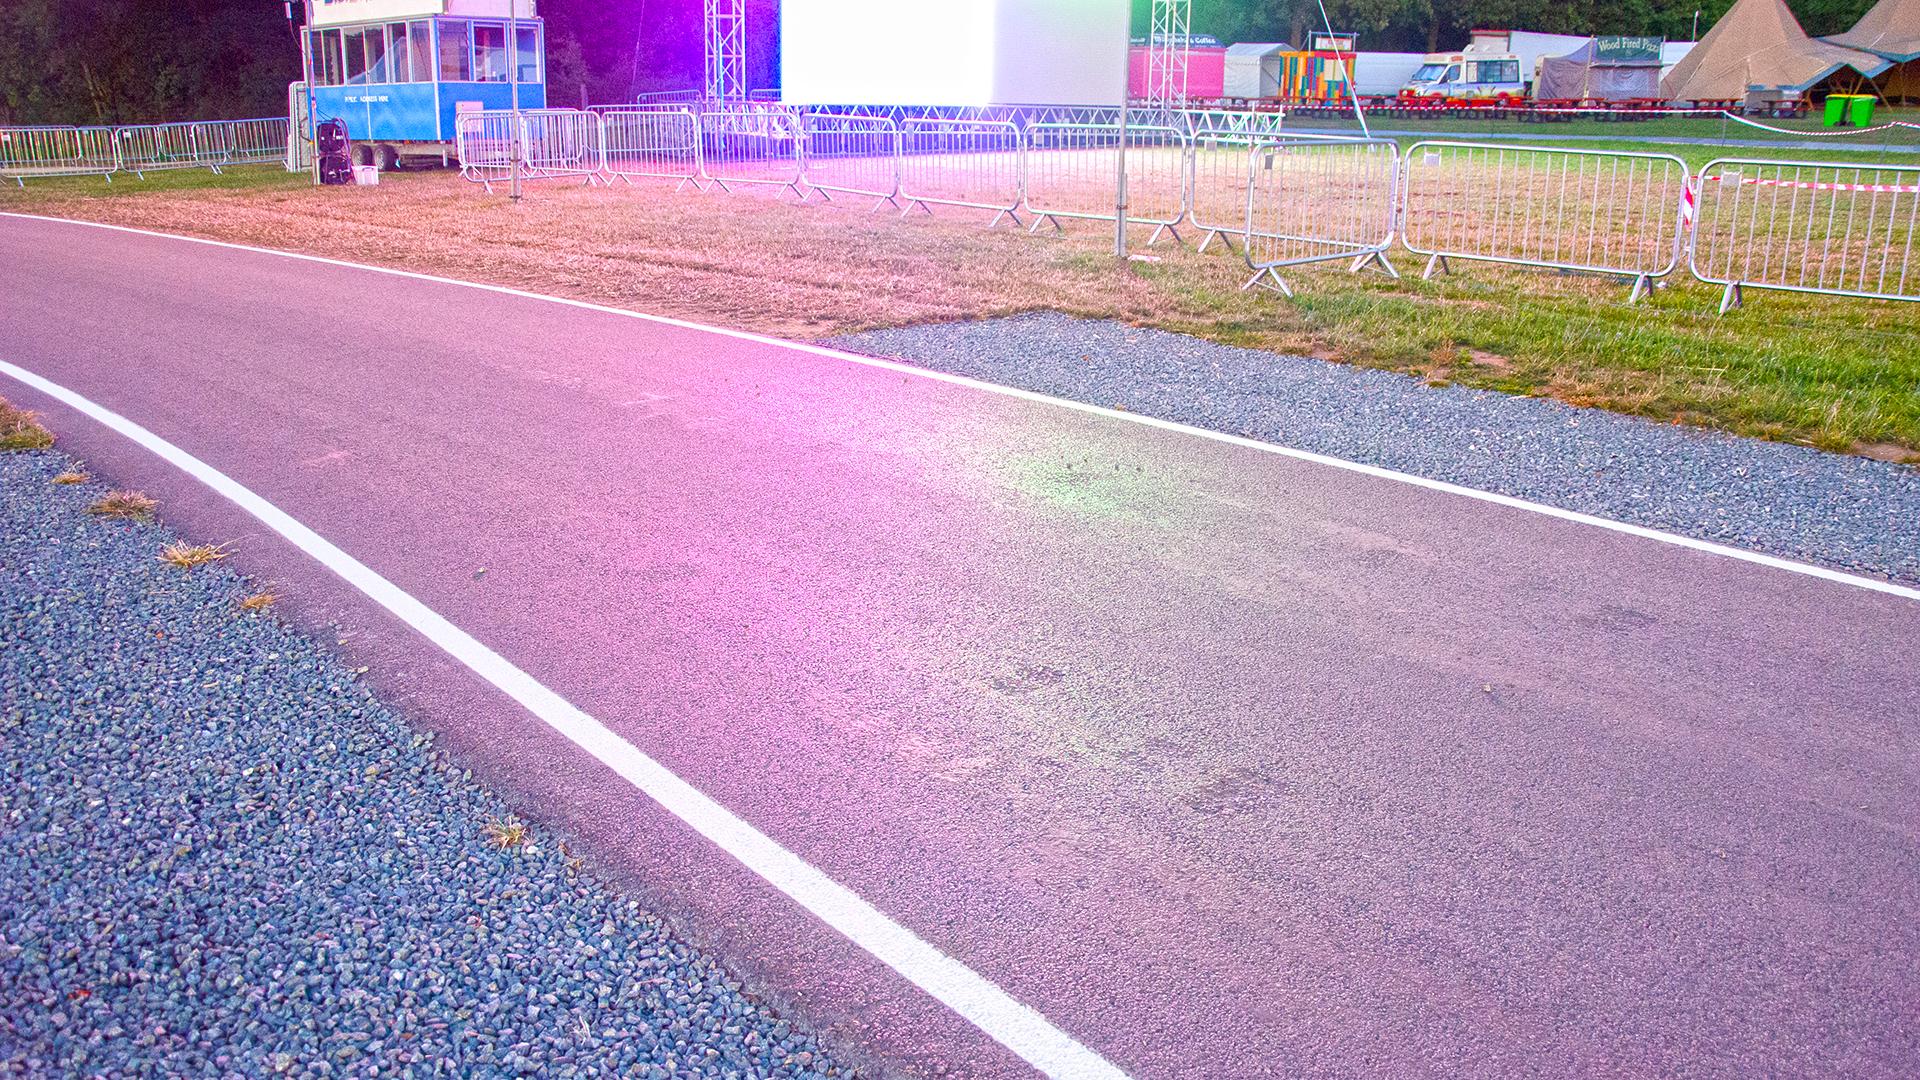 Carfest Road Marking 22